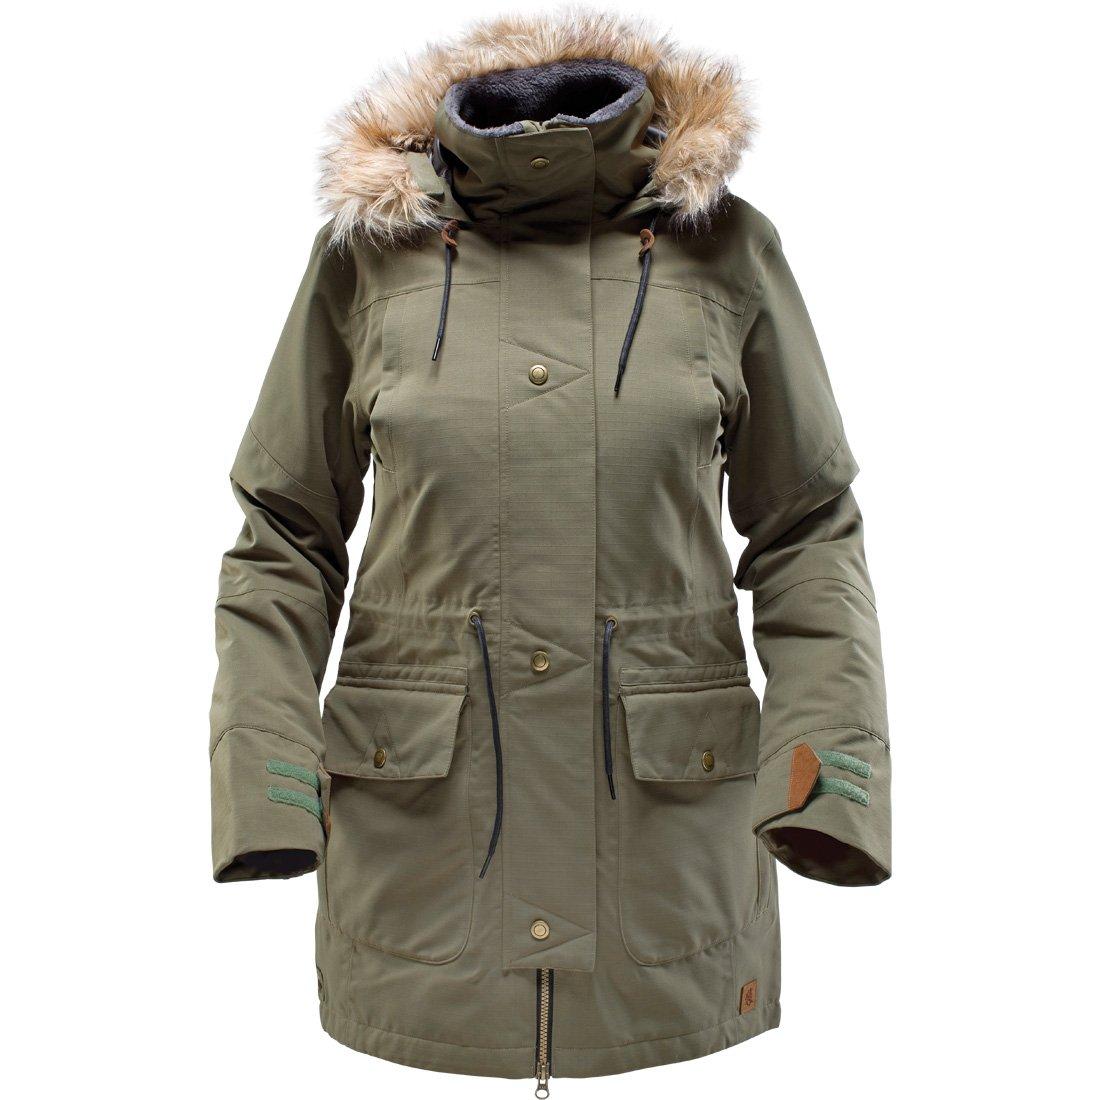 Damen Snowboard Jacke Cappel Thunder Jacket bestellen